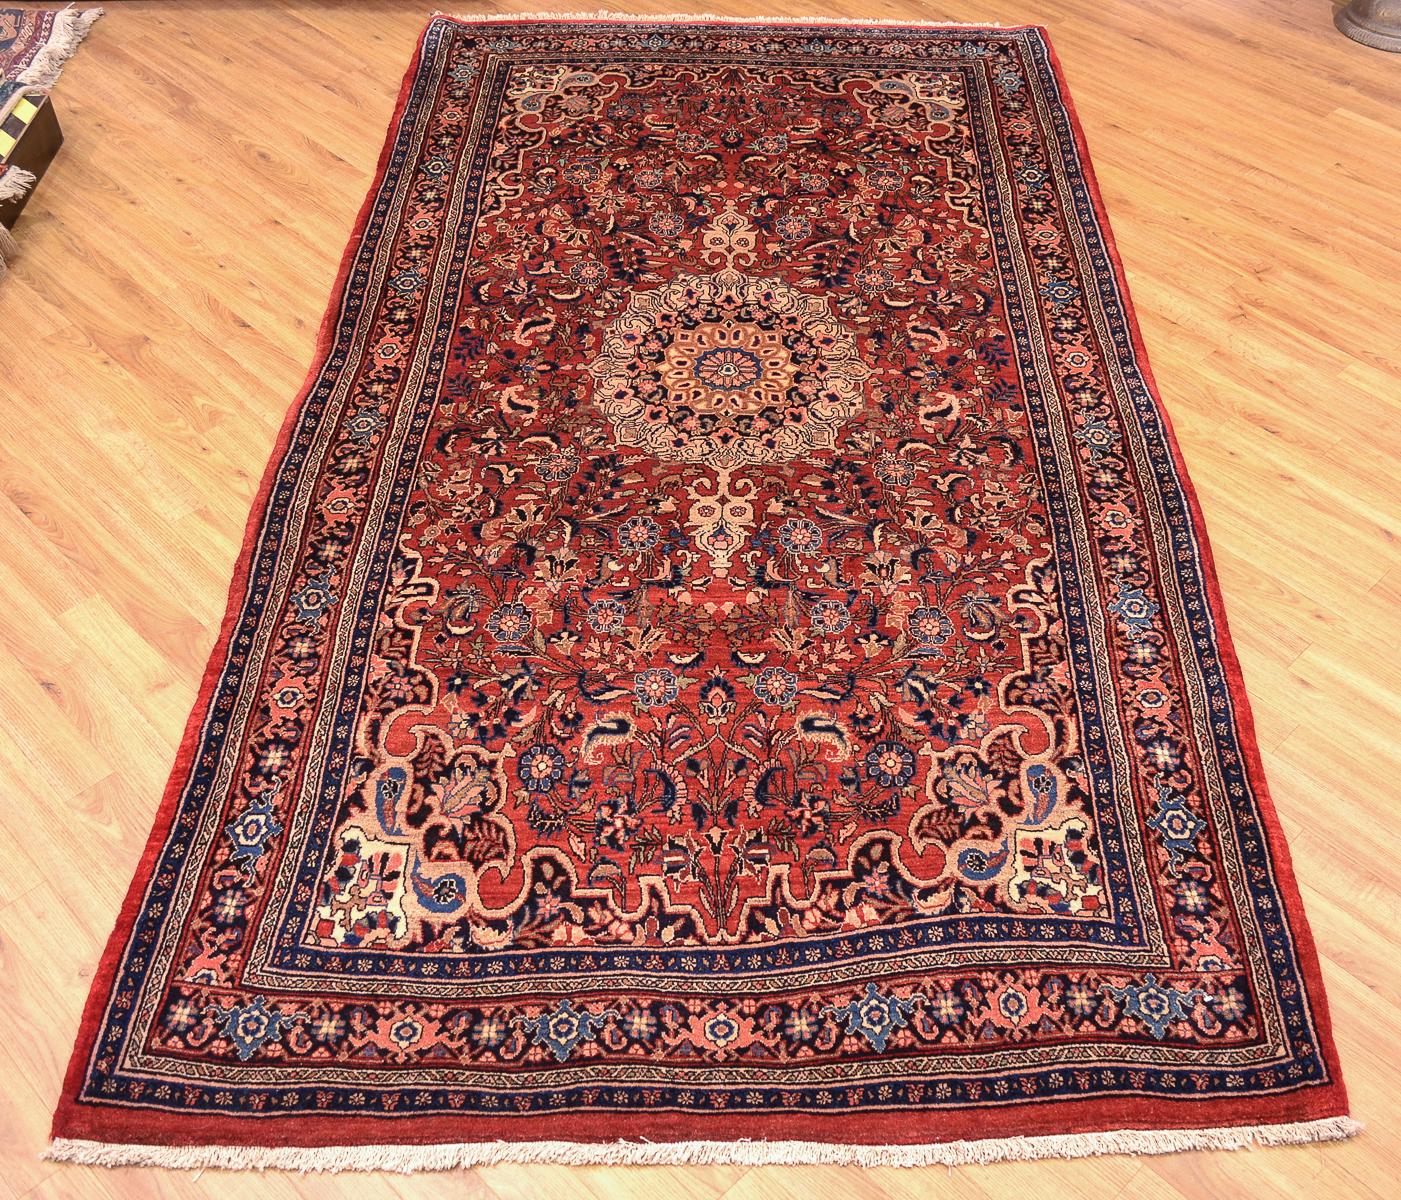 Old Persian Bidjar Carpet 2.77x1.50m